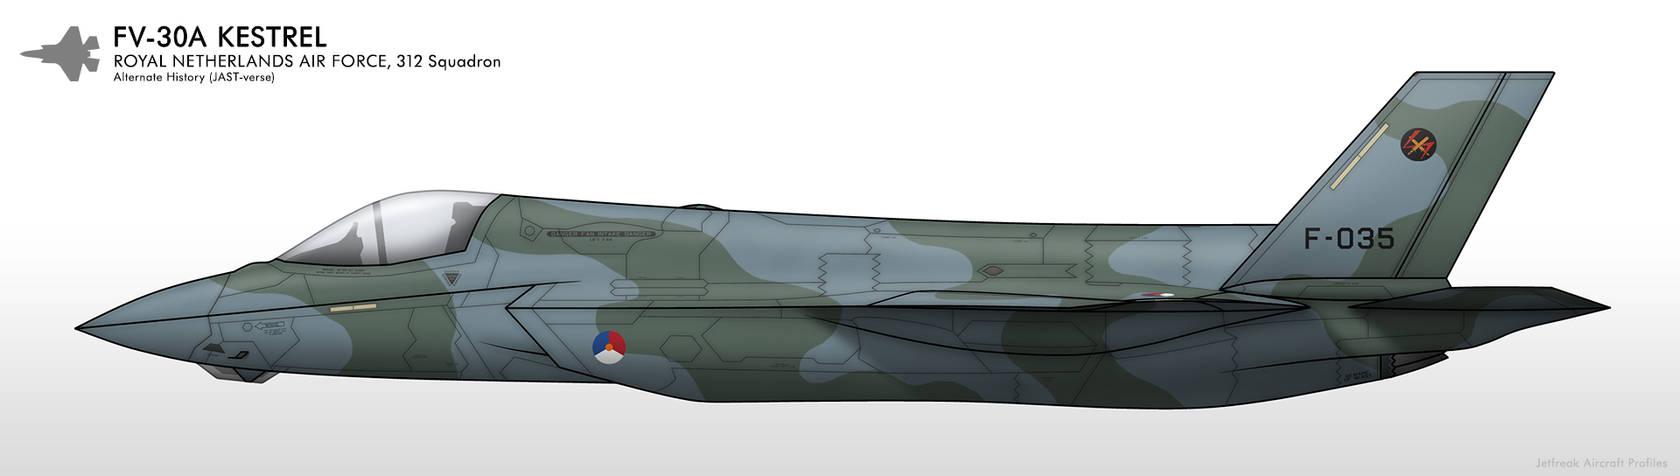 FV-30A - Royal Netherlands Air Force